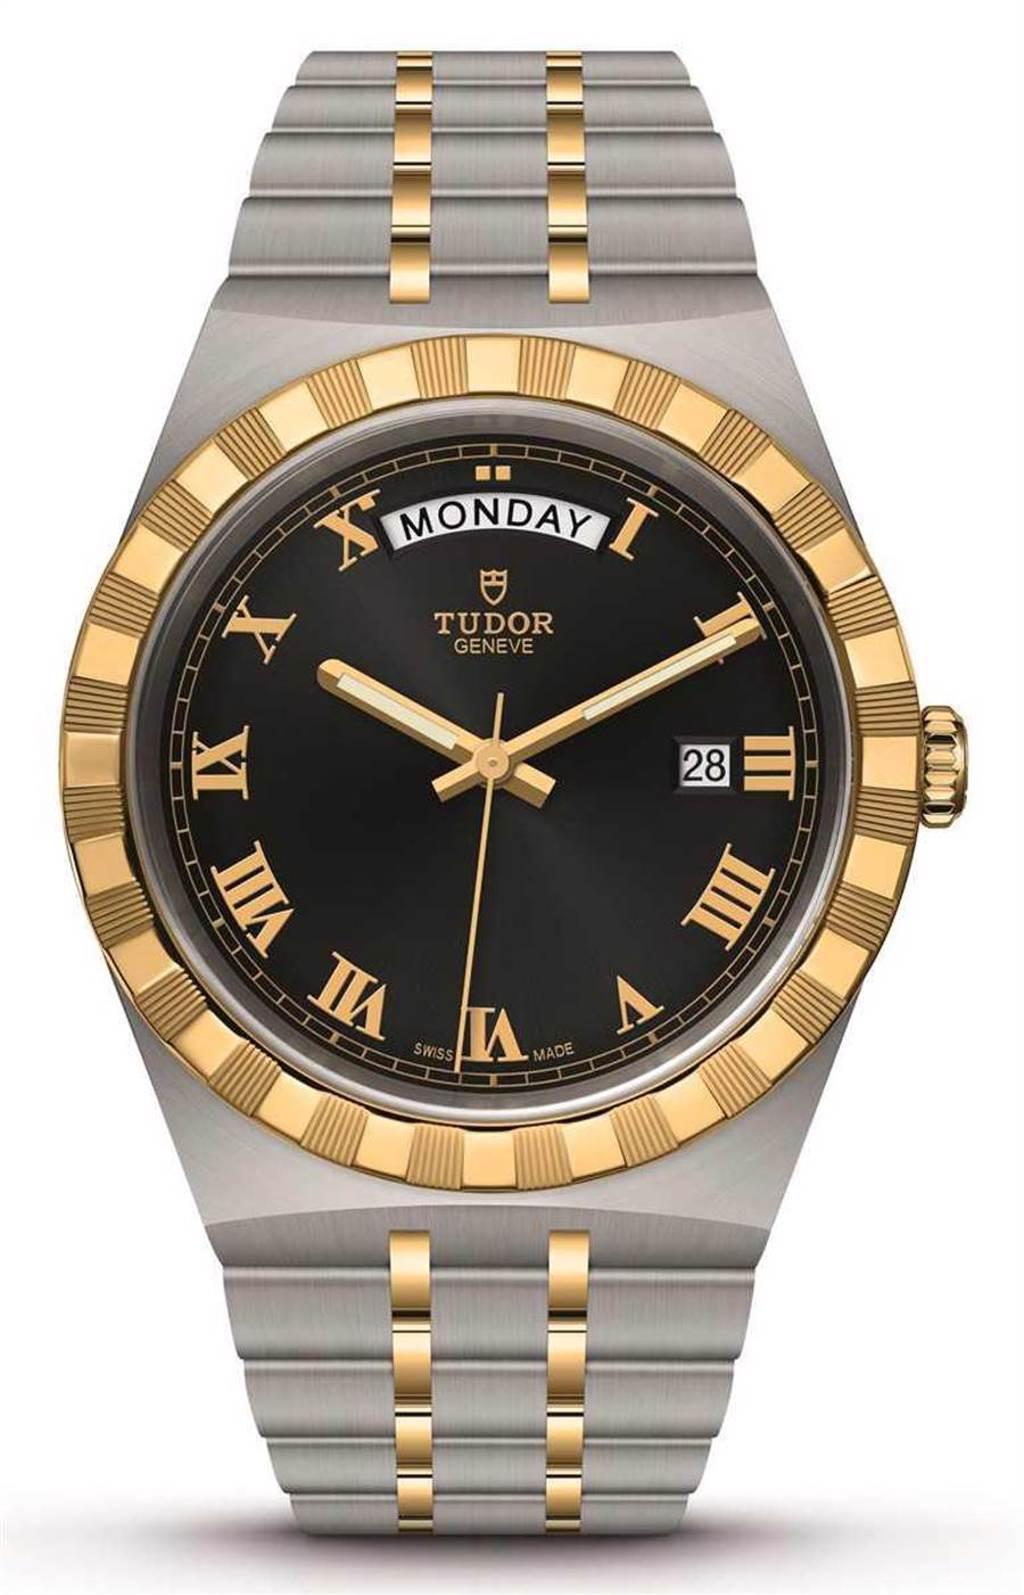 TUDOR「Royal皇家系列」腕錶,316L不鏽鋼錶殼,黃金鋼錶帶,41mm╱107,000元。(圖╱TUDOR提供)